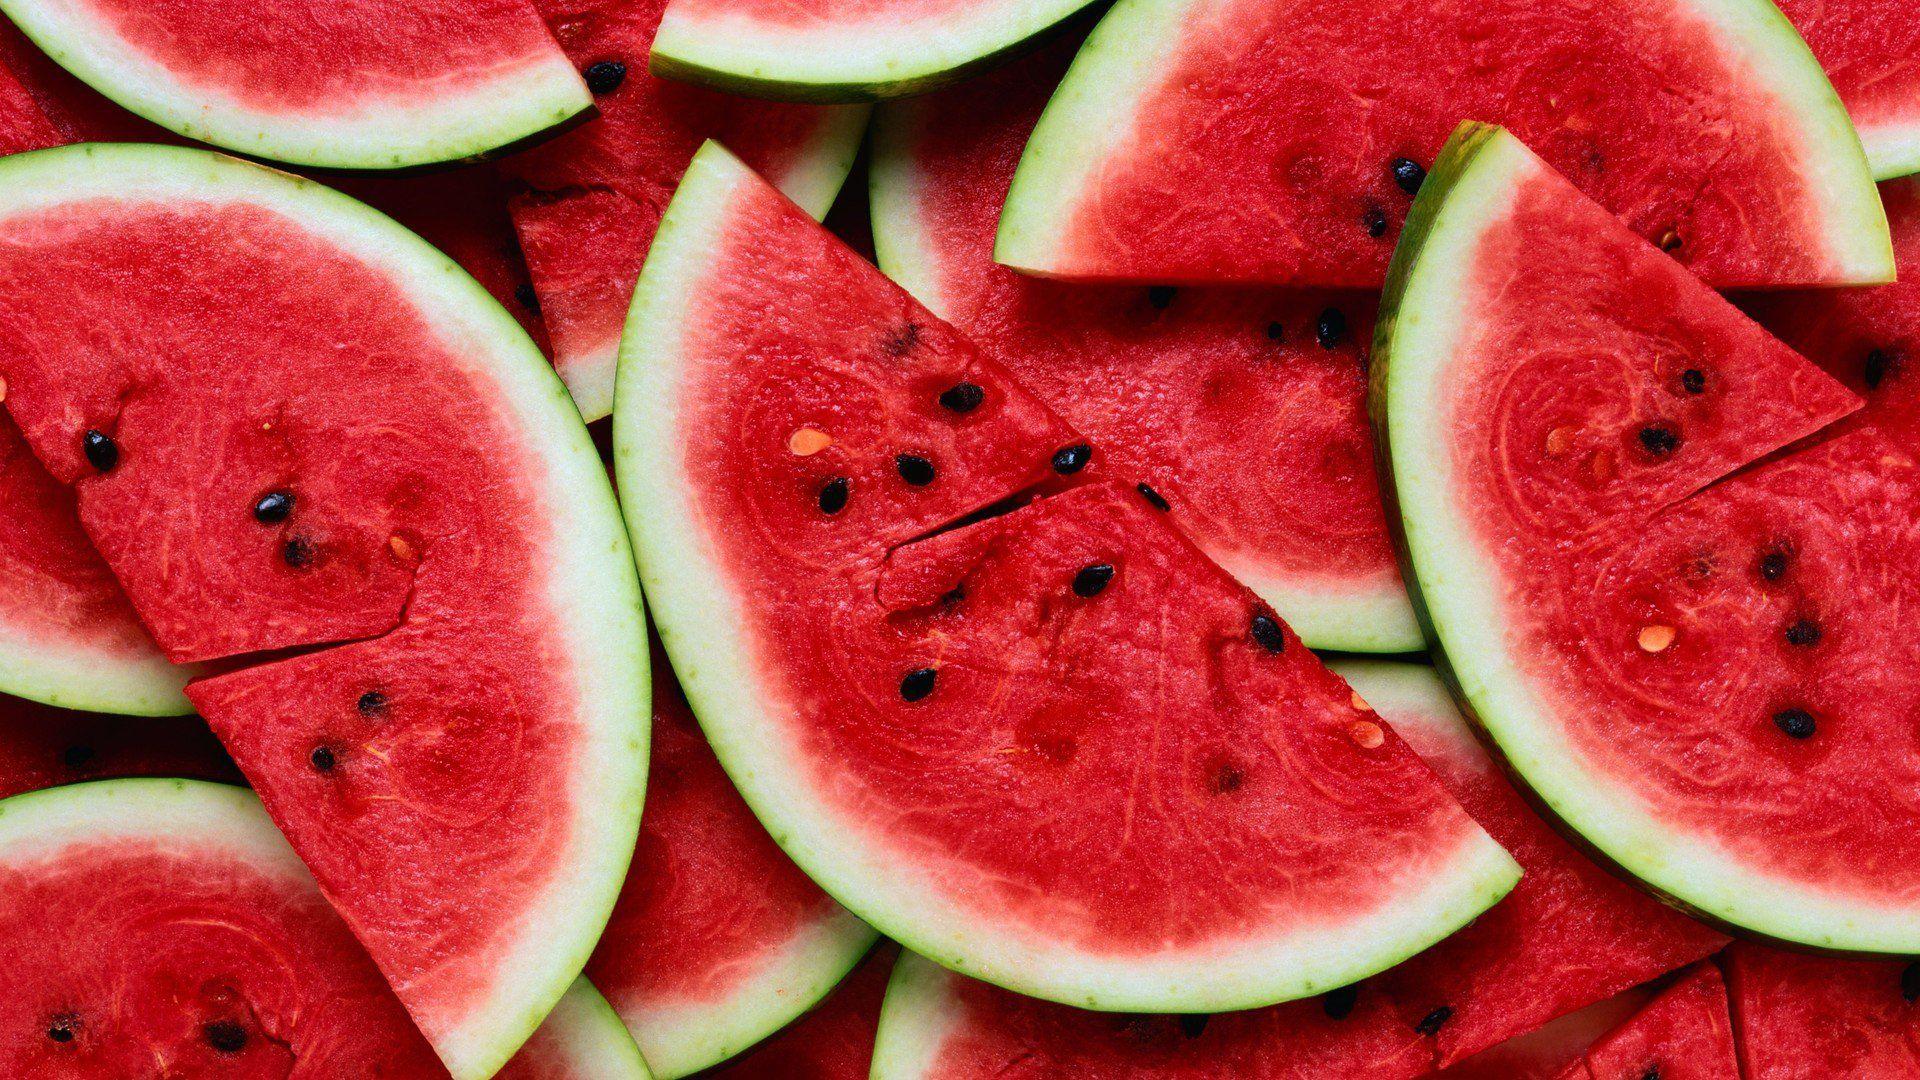 watermelons pics